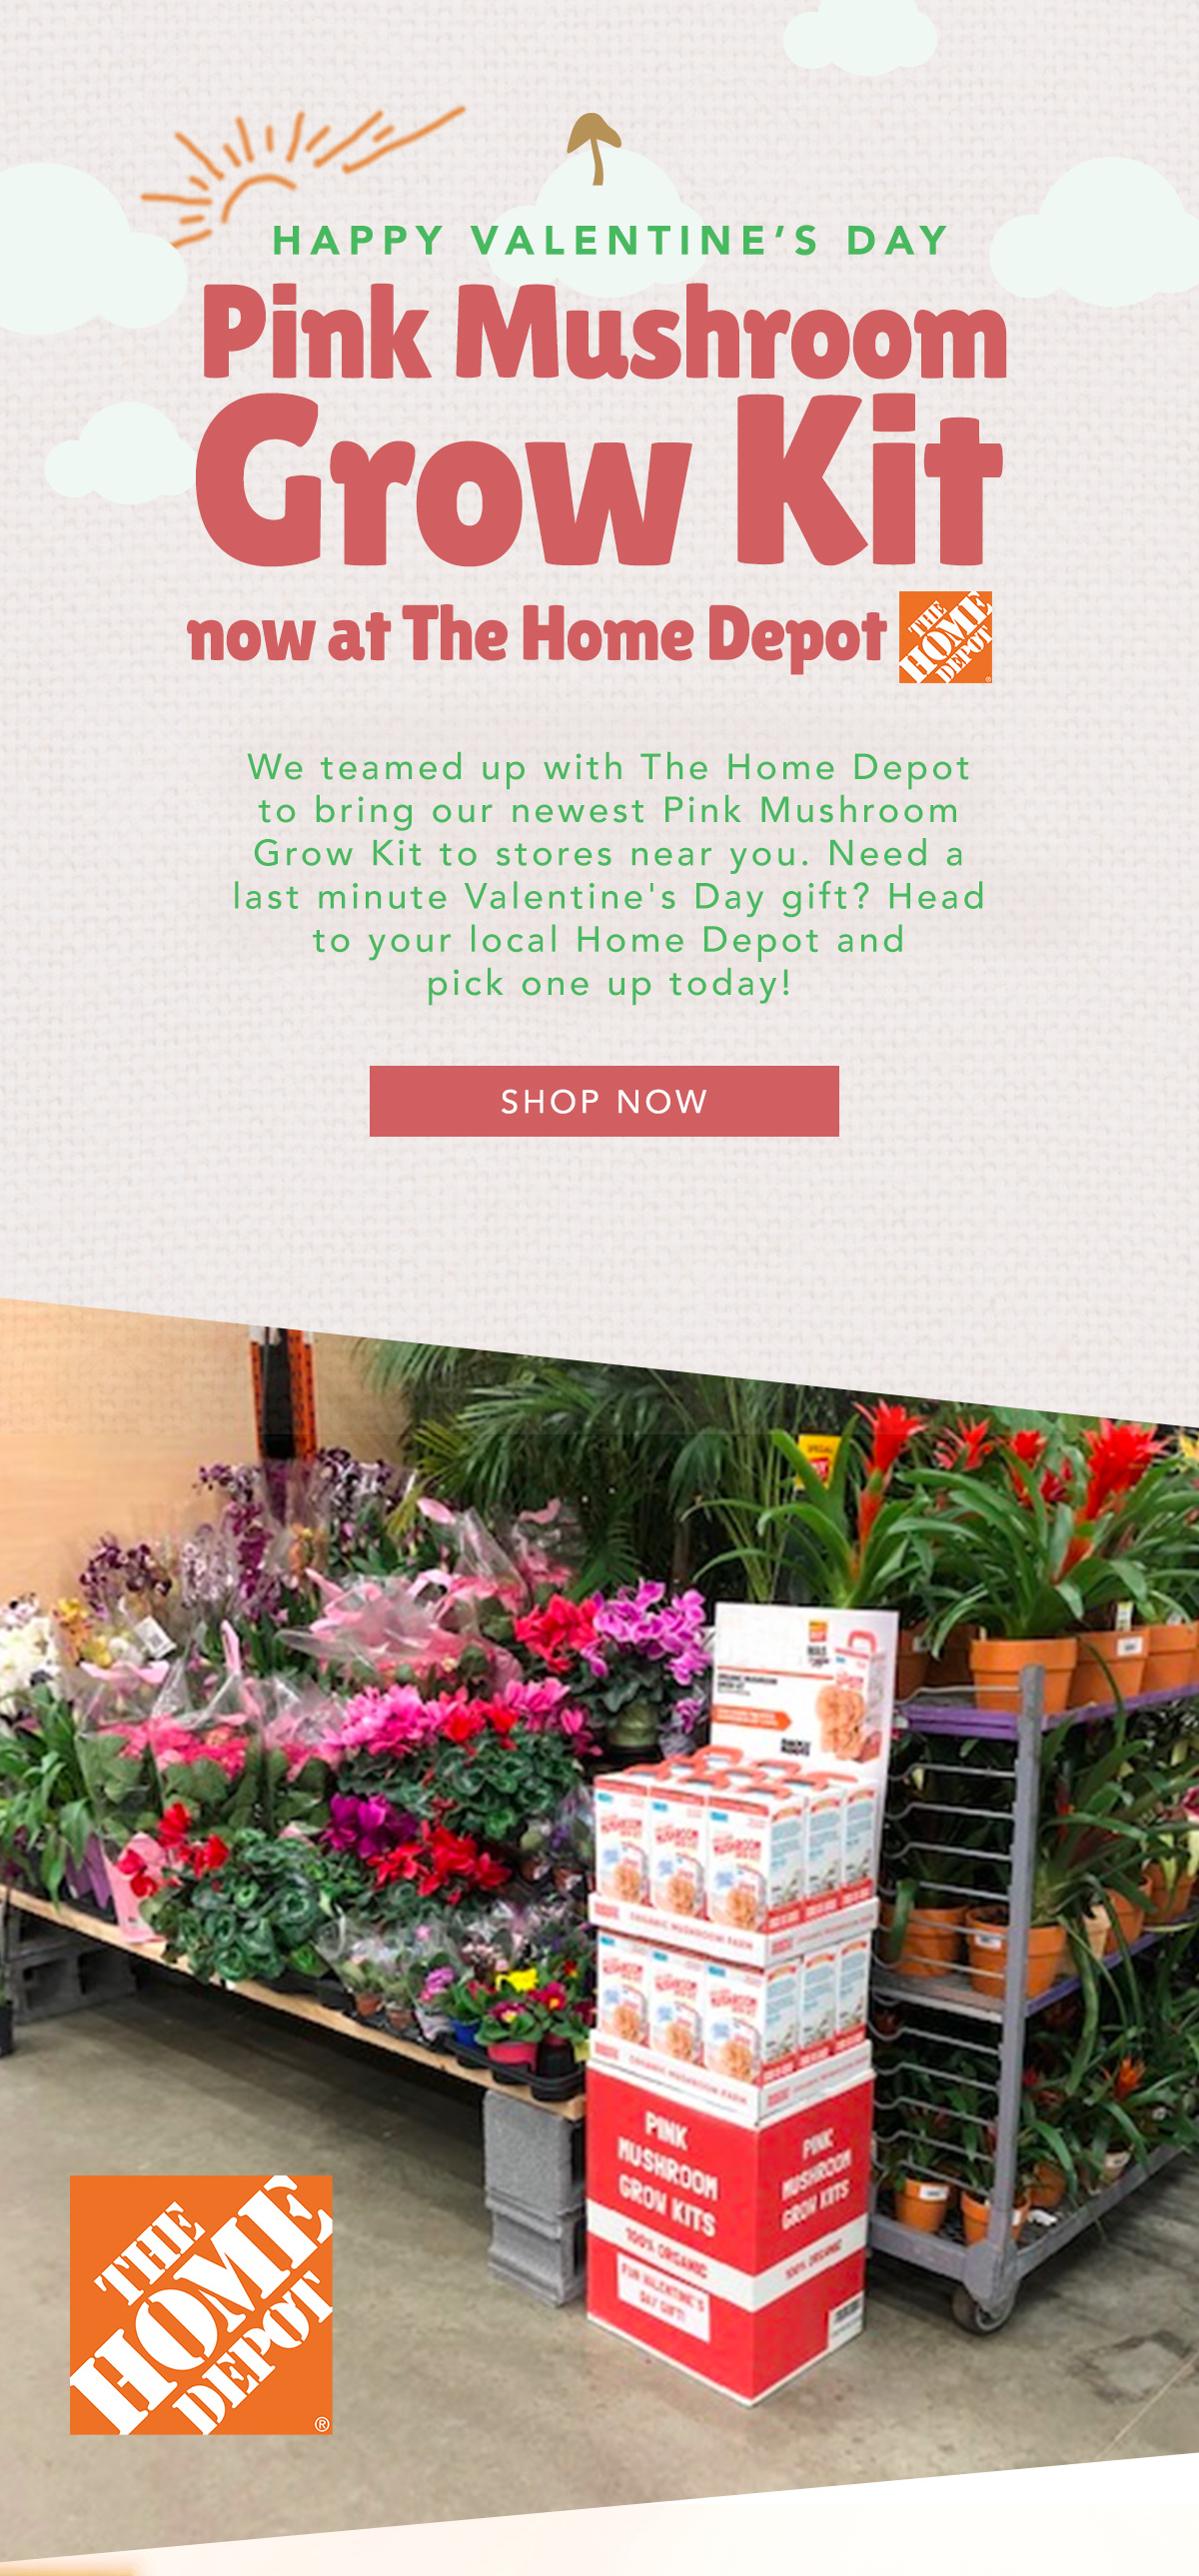 Water Garden: Now at The Home Depot: Pink Mushroom Grow Kit